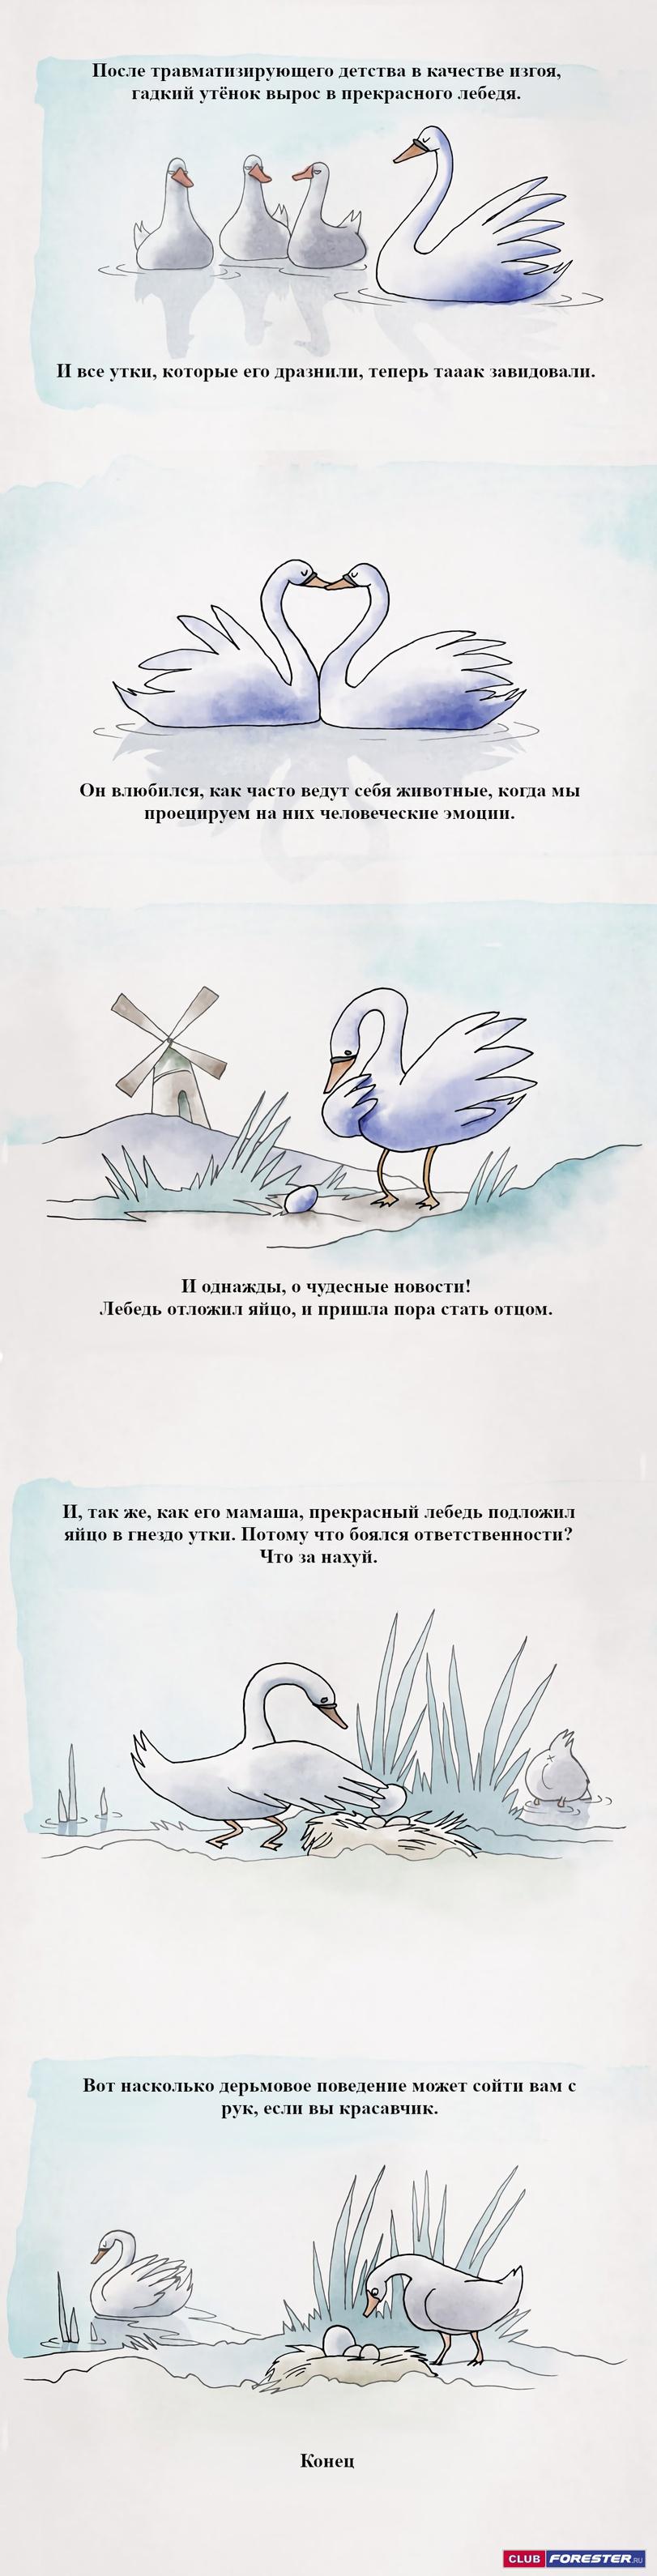 Комиксы-Oglaf-T&D-4820419.jpeg